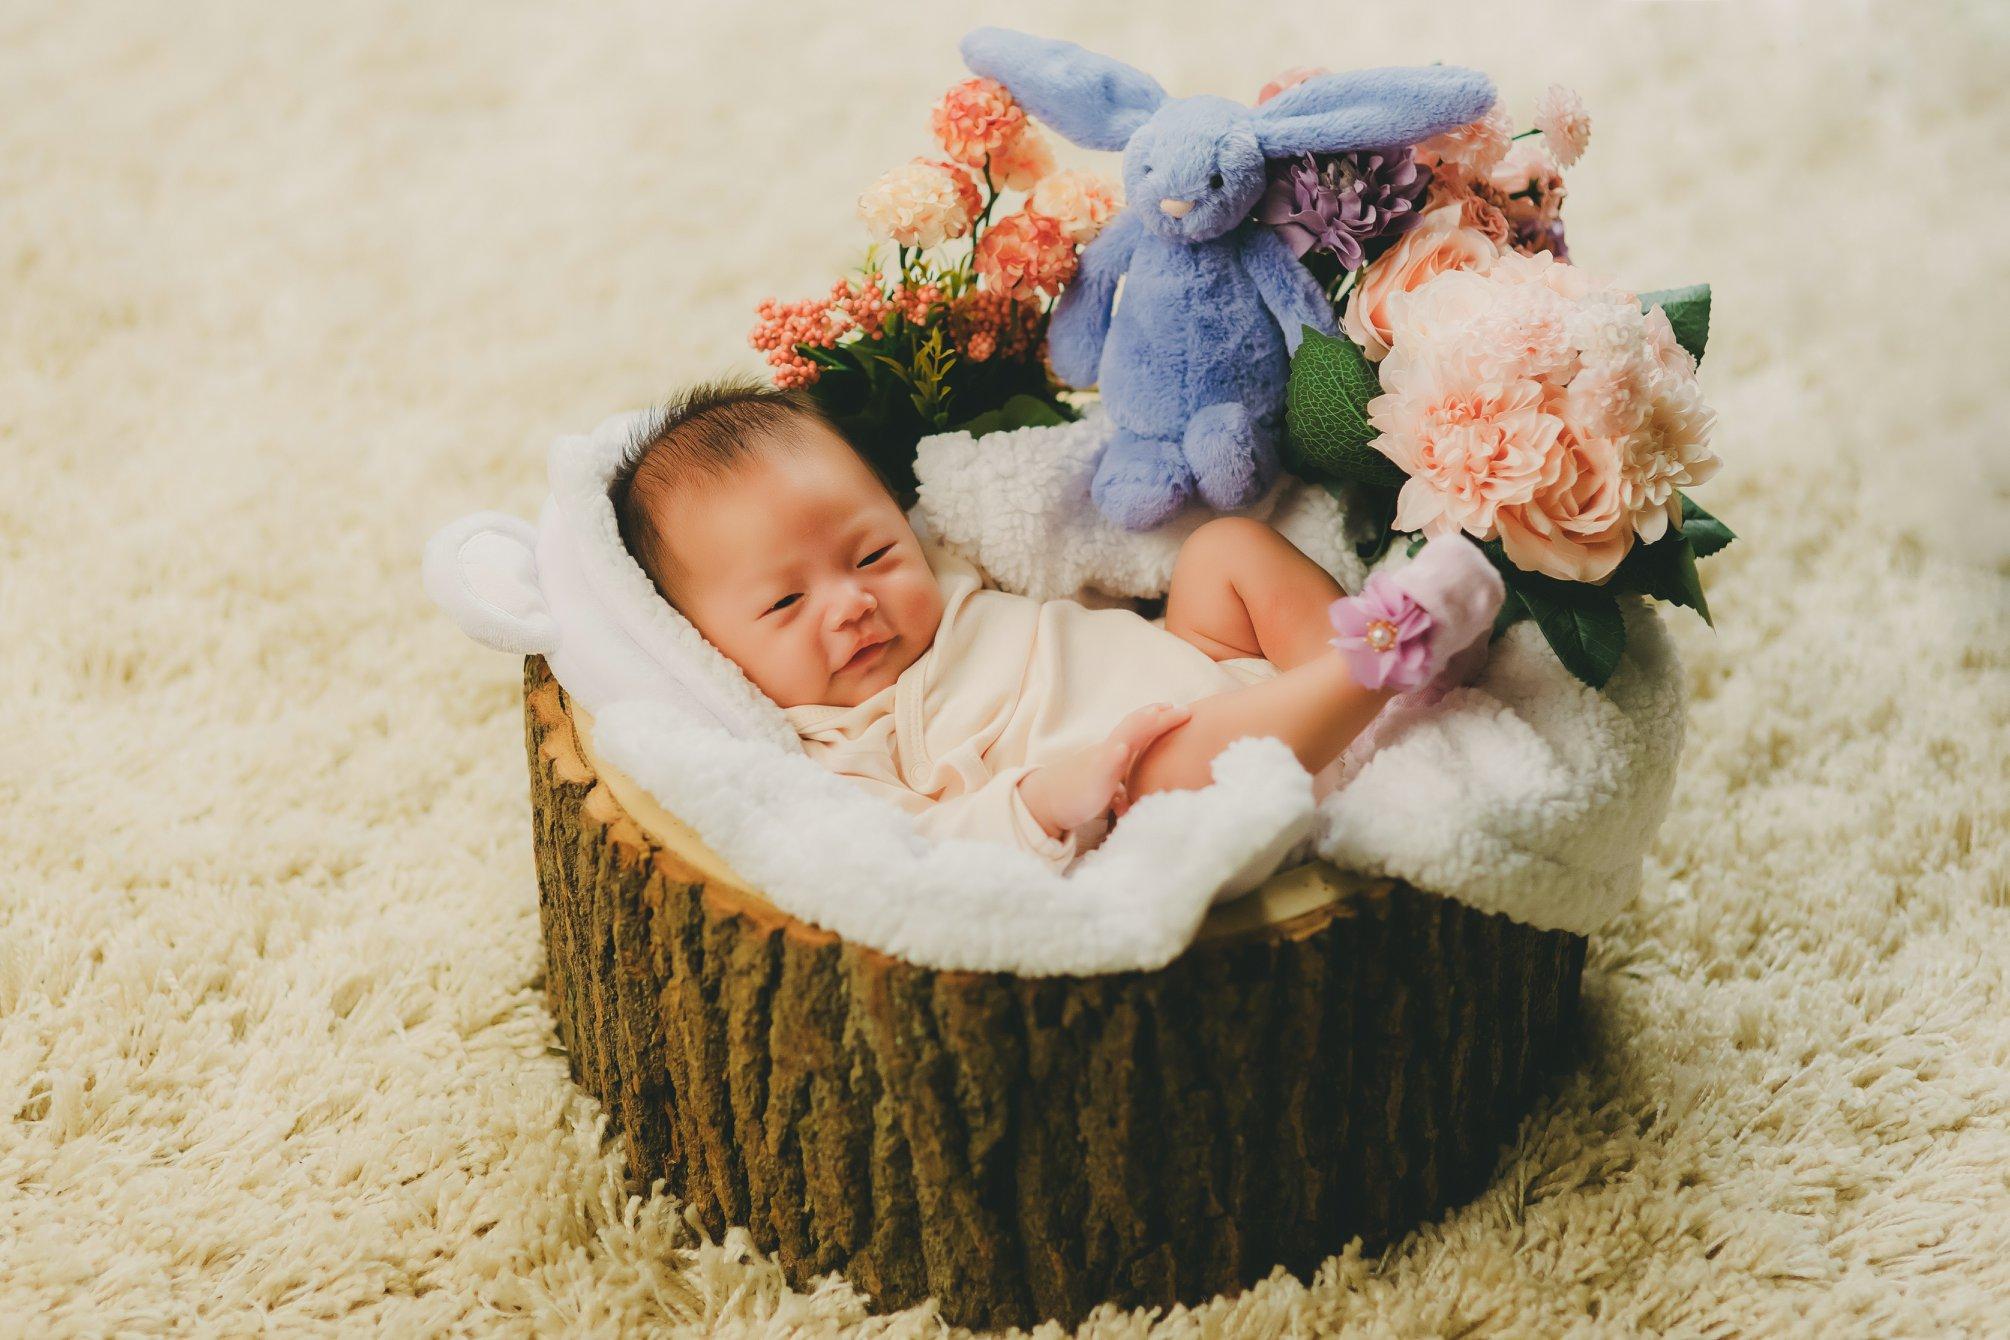 Singapore newborn photography studio hong ray photography